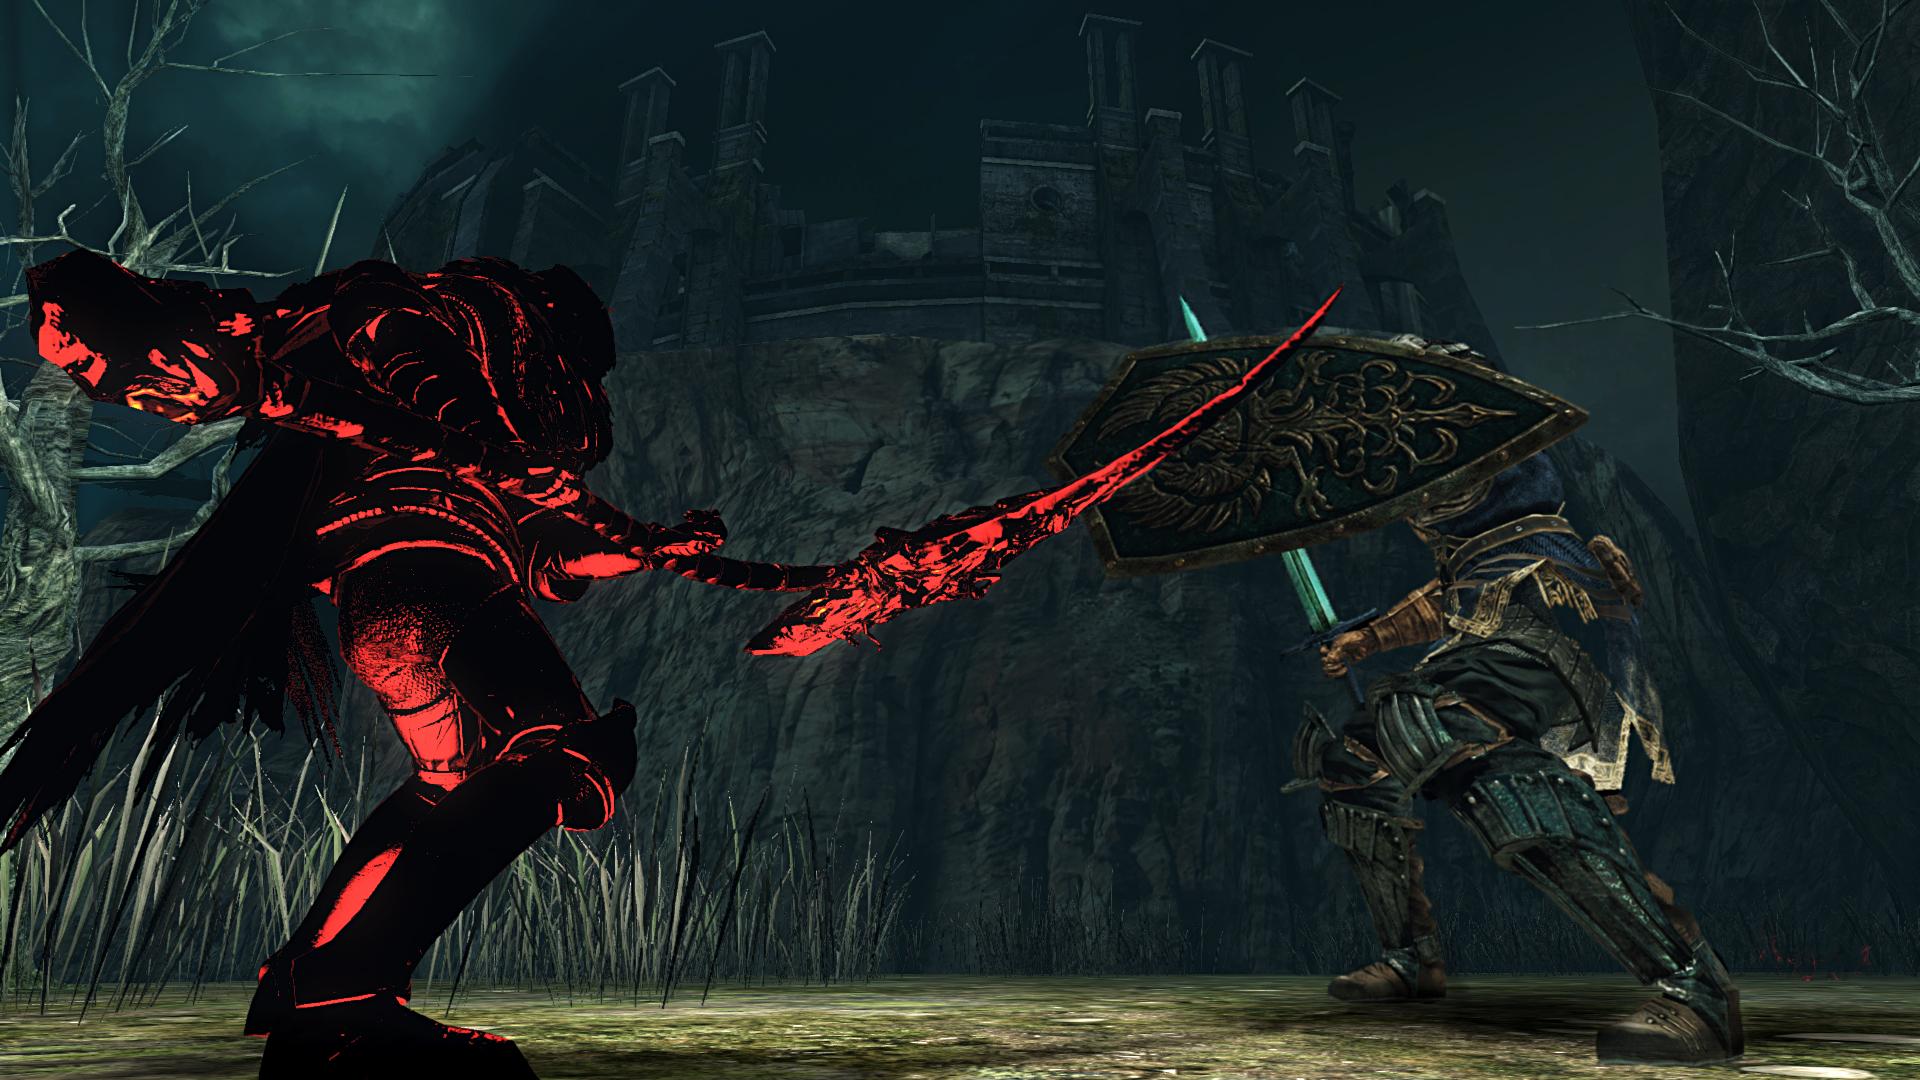 Obrazem: Temné dungeony, kostlivci a monstra z Dark Souls 2: Scholar of the First Sin 107569